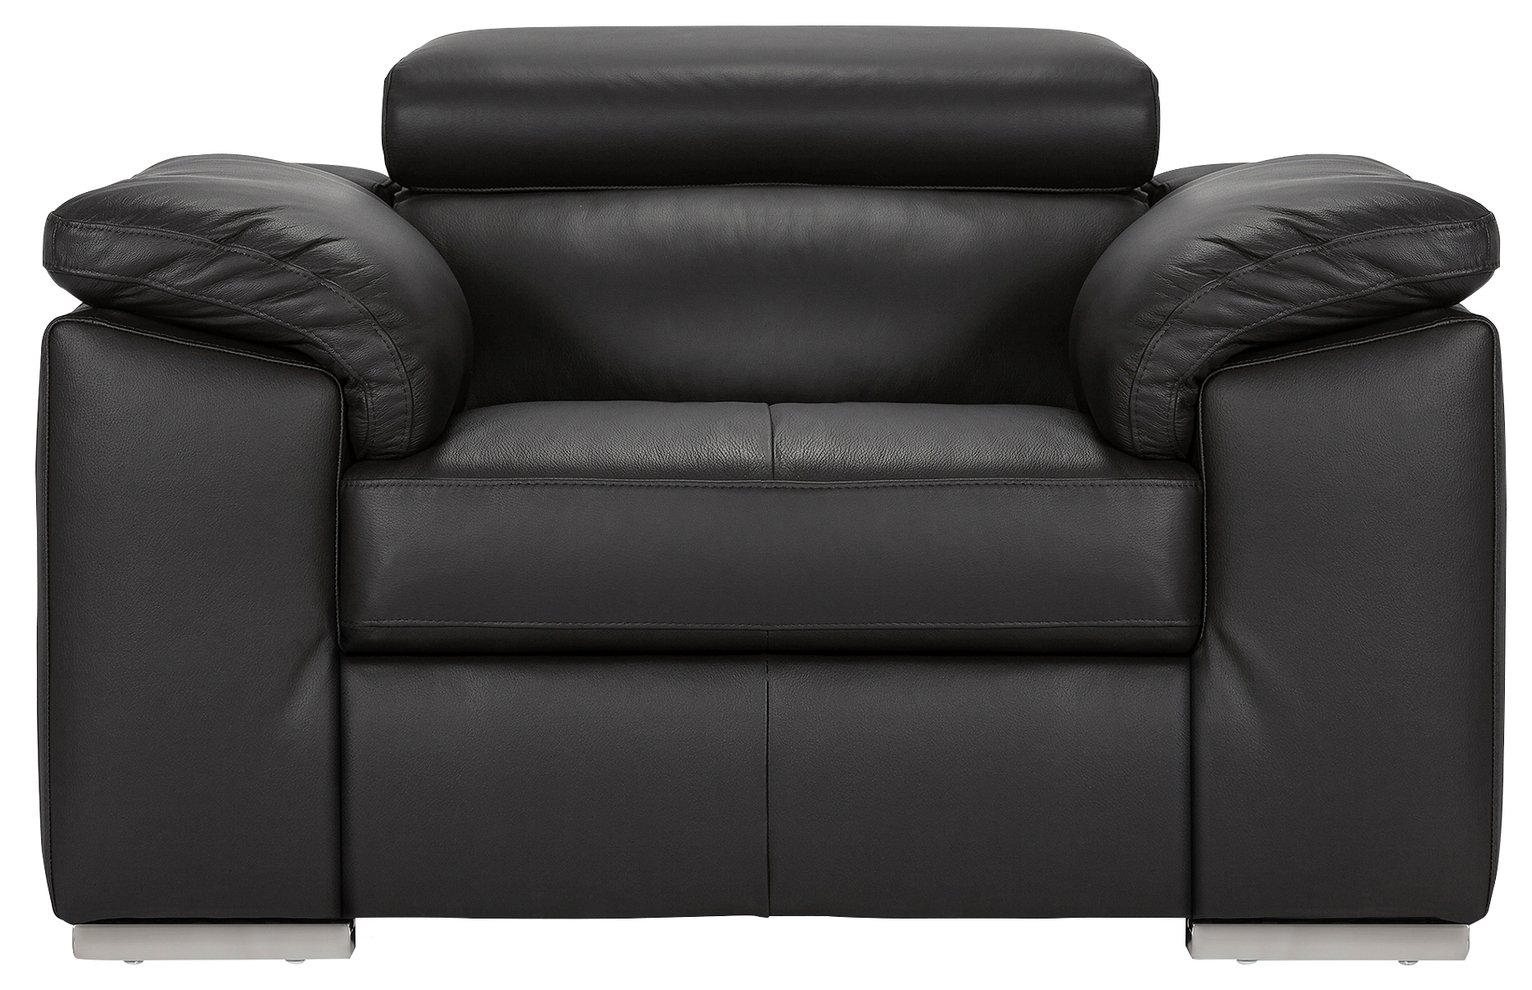 Argos Home Valencia Leather Armchair - Black